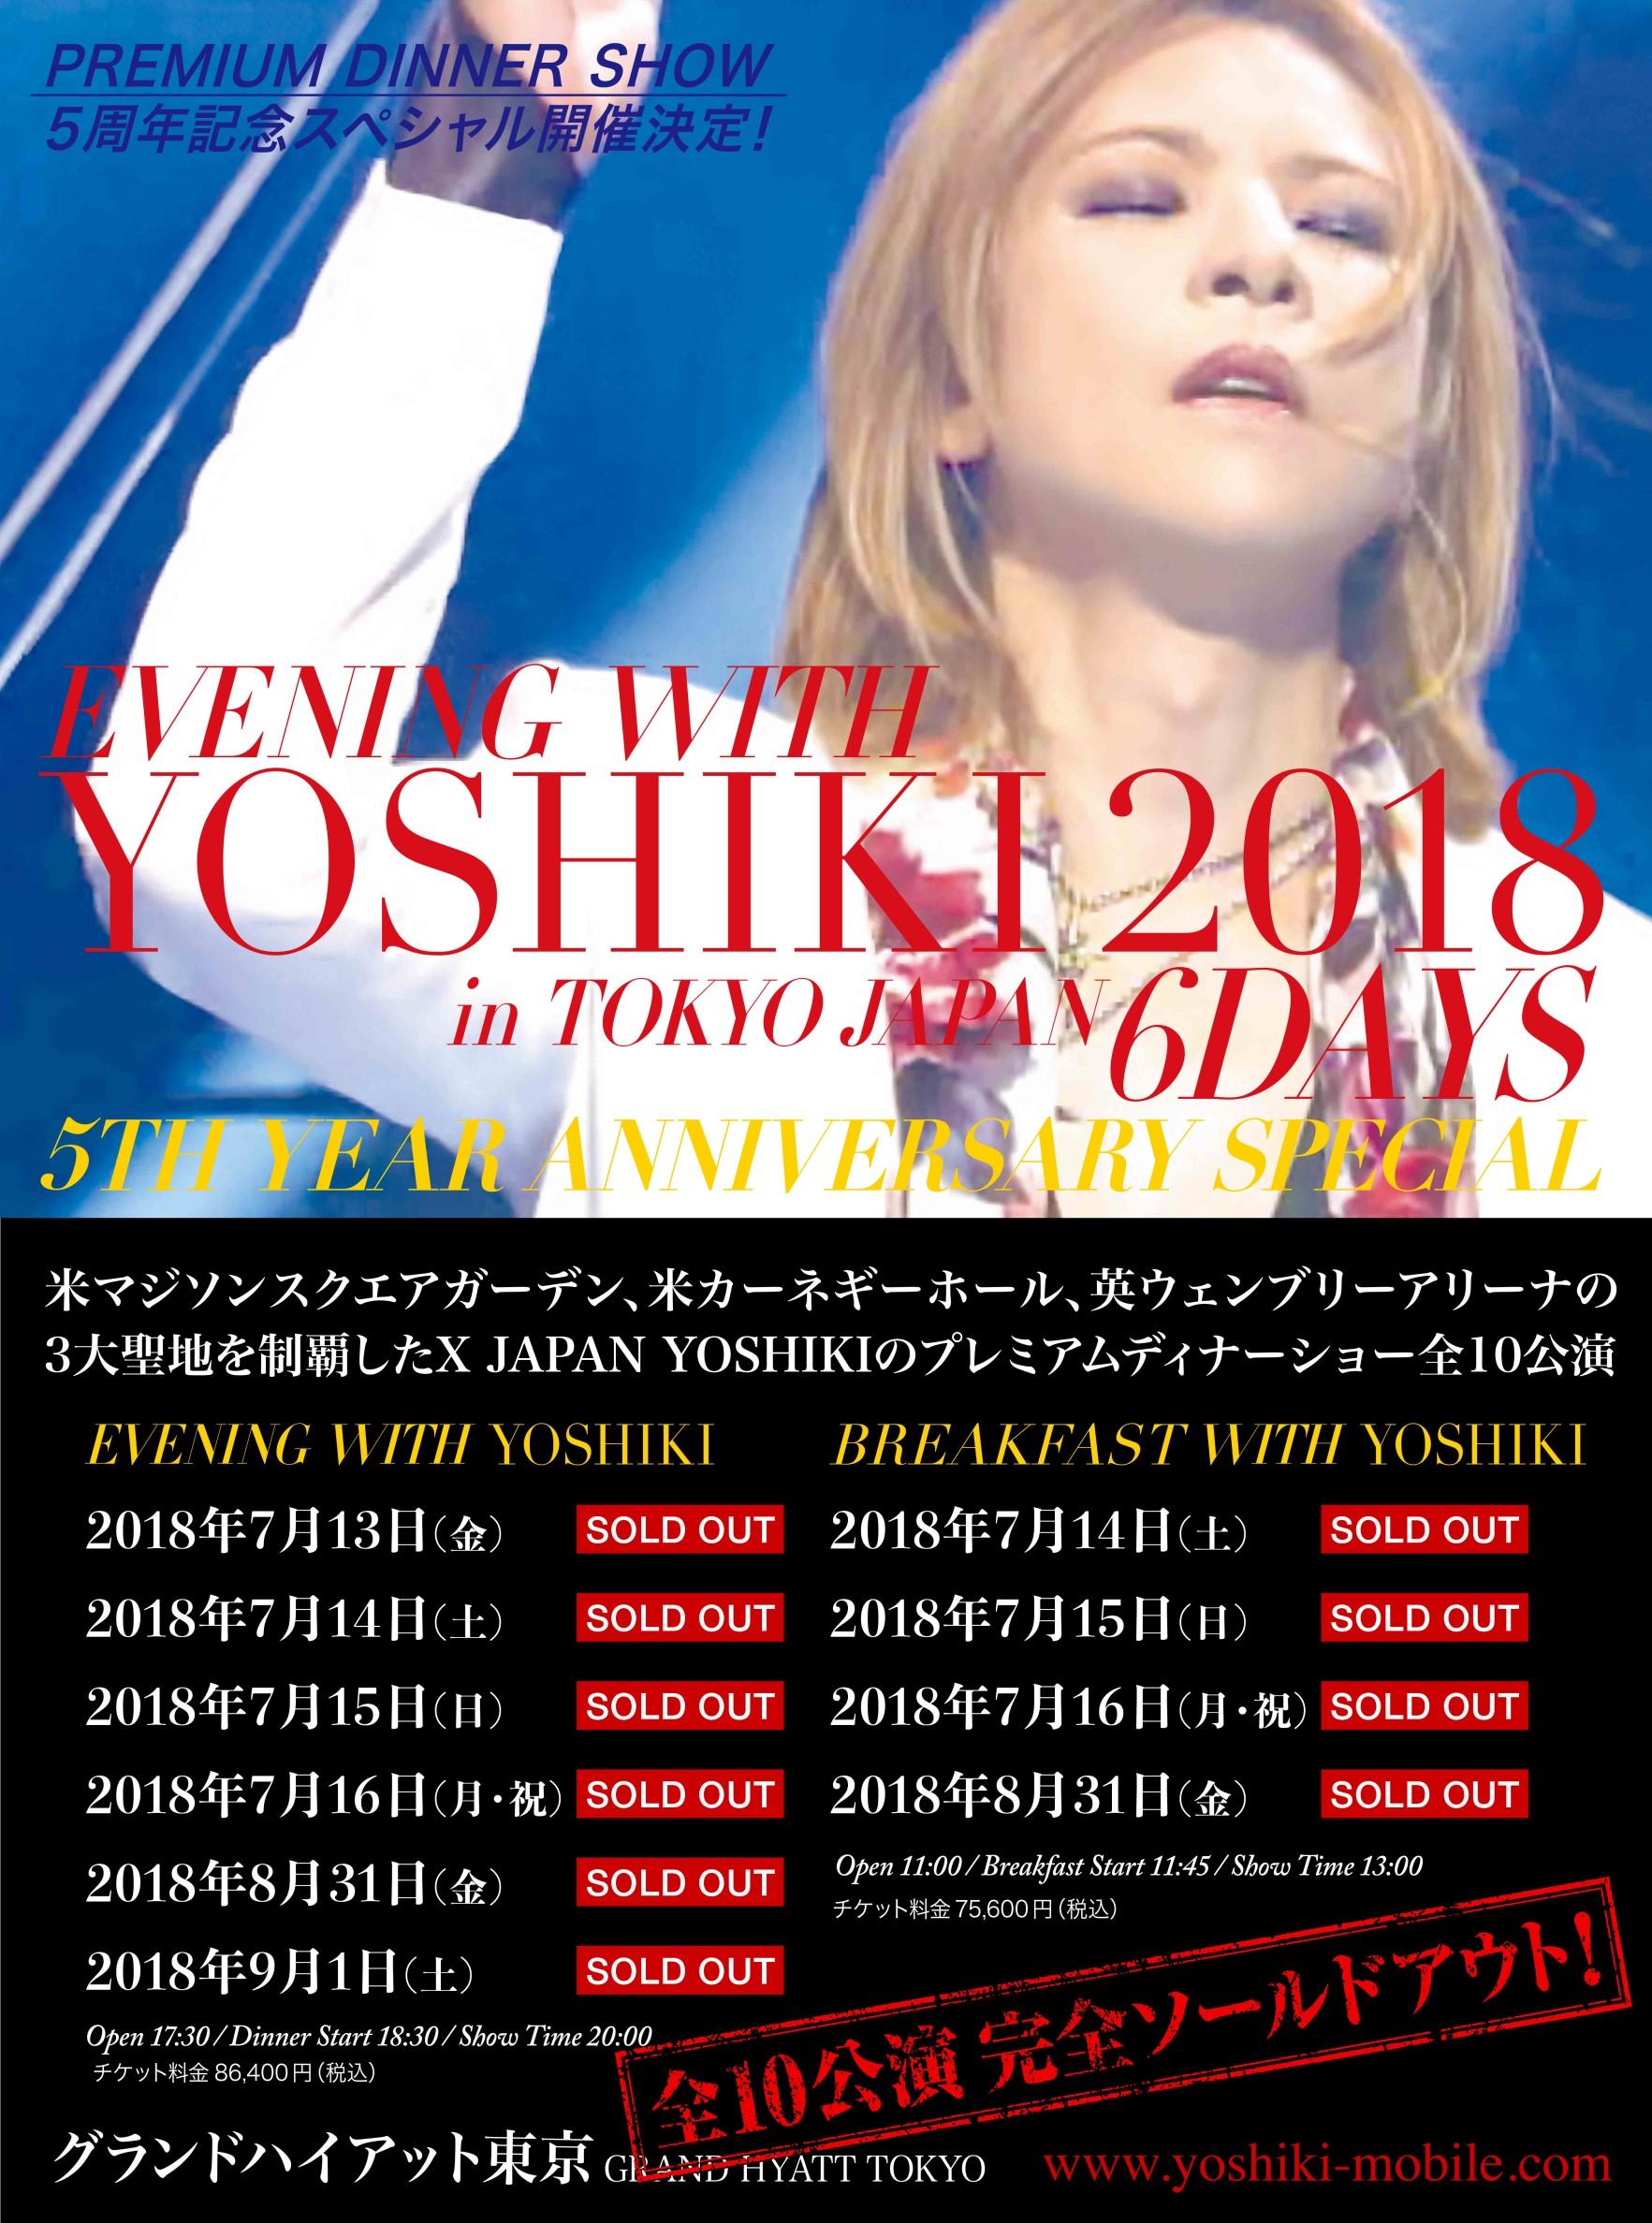 RMMS-Yoshiki-Dinner-Show-5th-Anniversary-2018-N-Poster